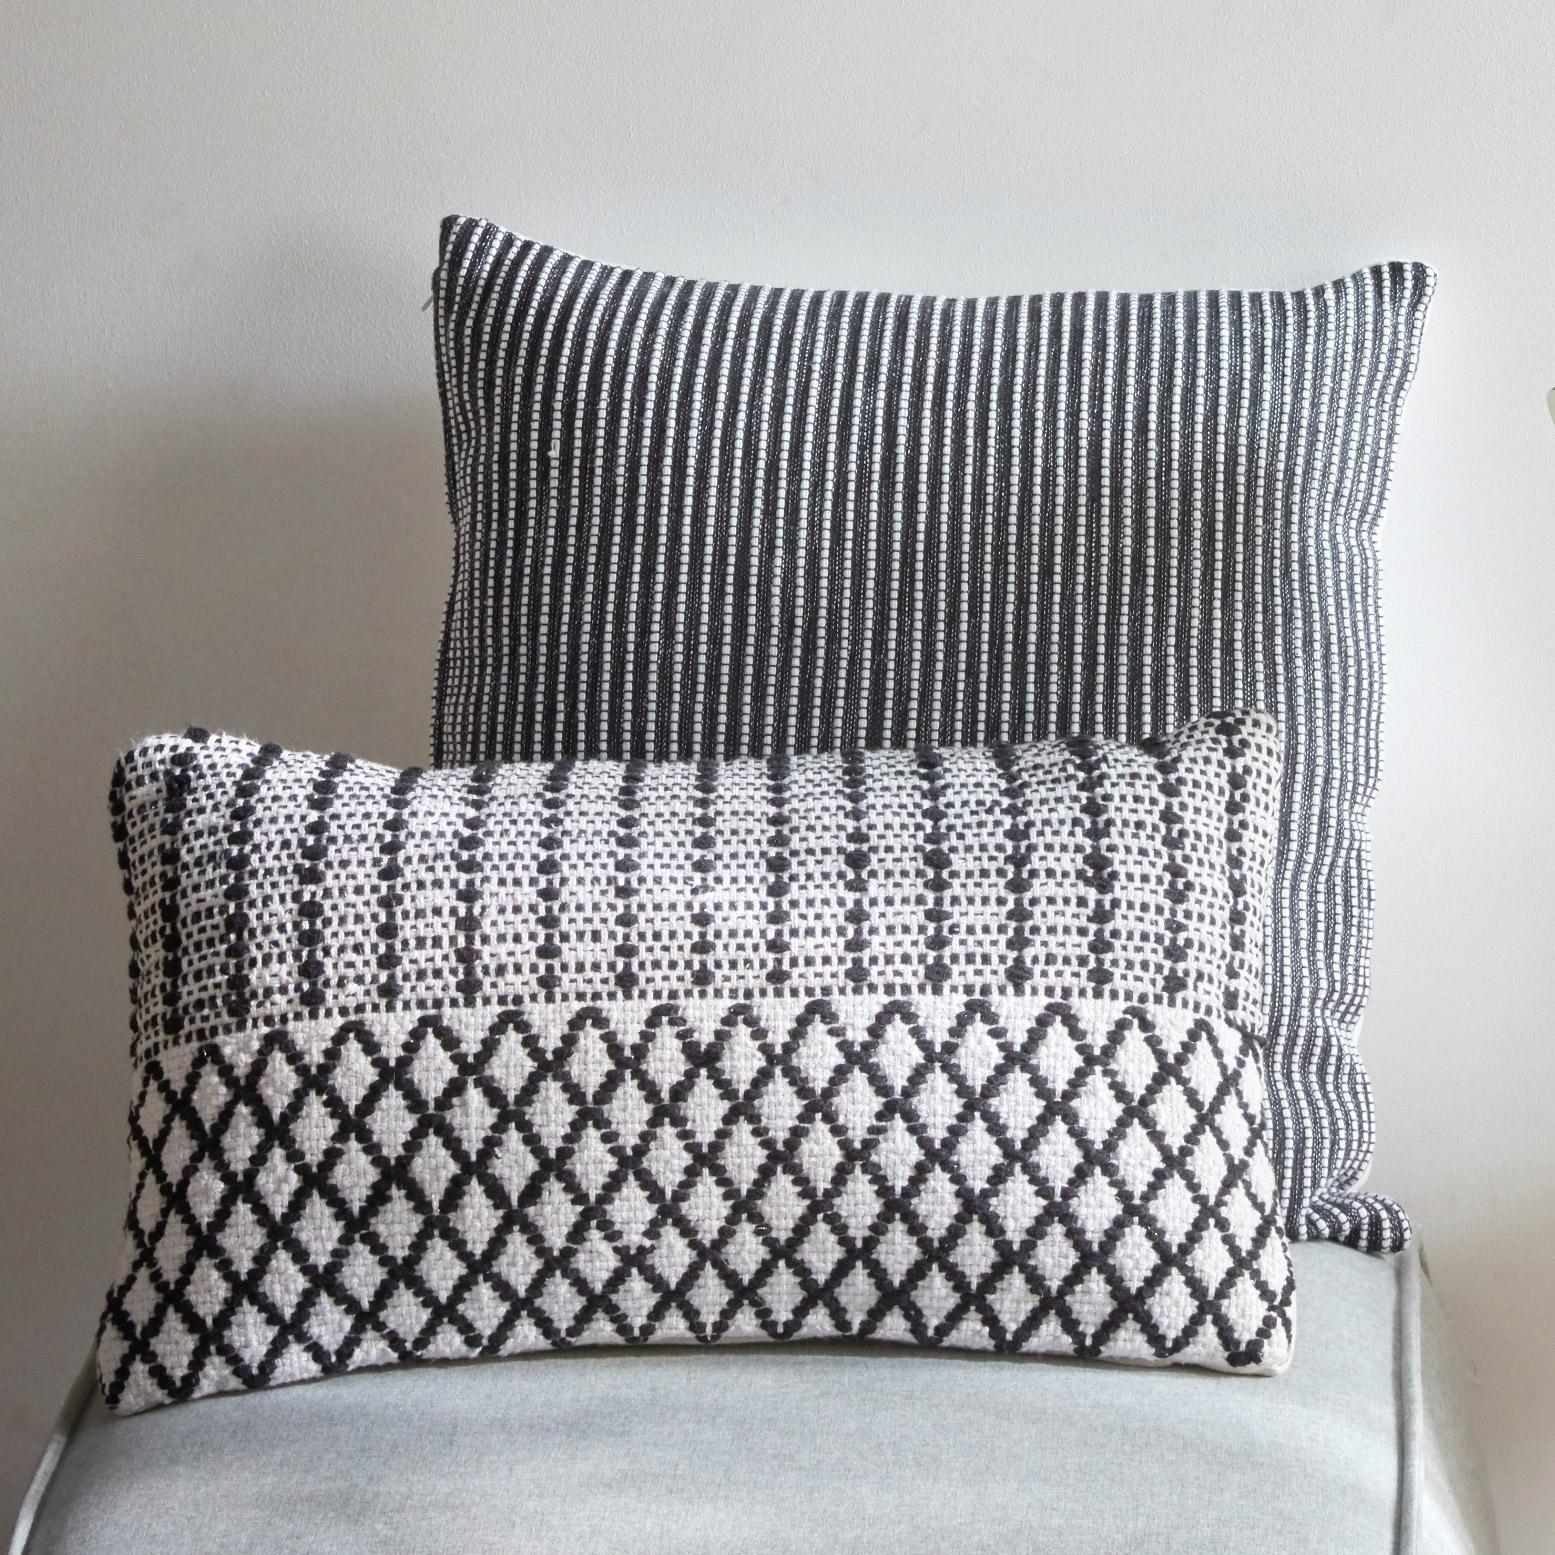 Coussin Haseya INSPIRE, blanc / noir l.50 x H.30 cm